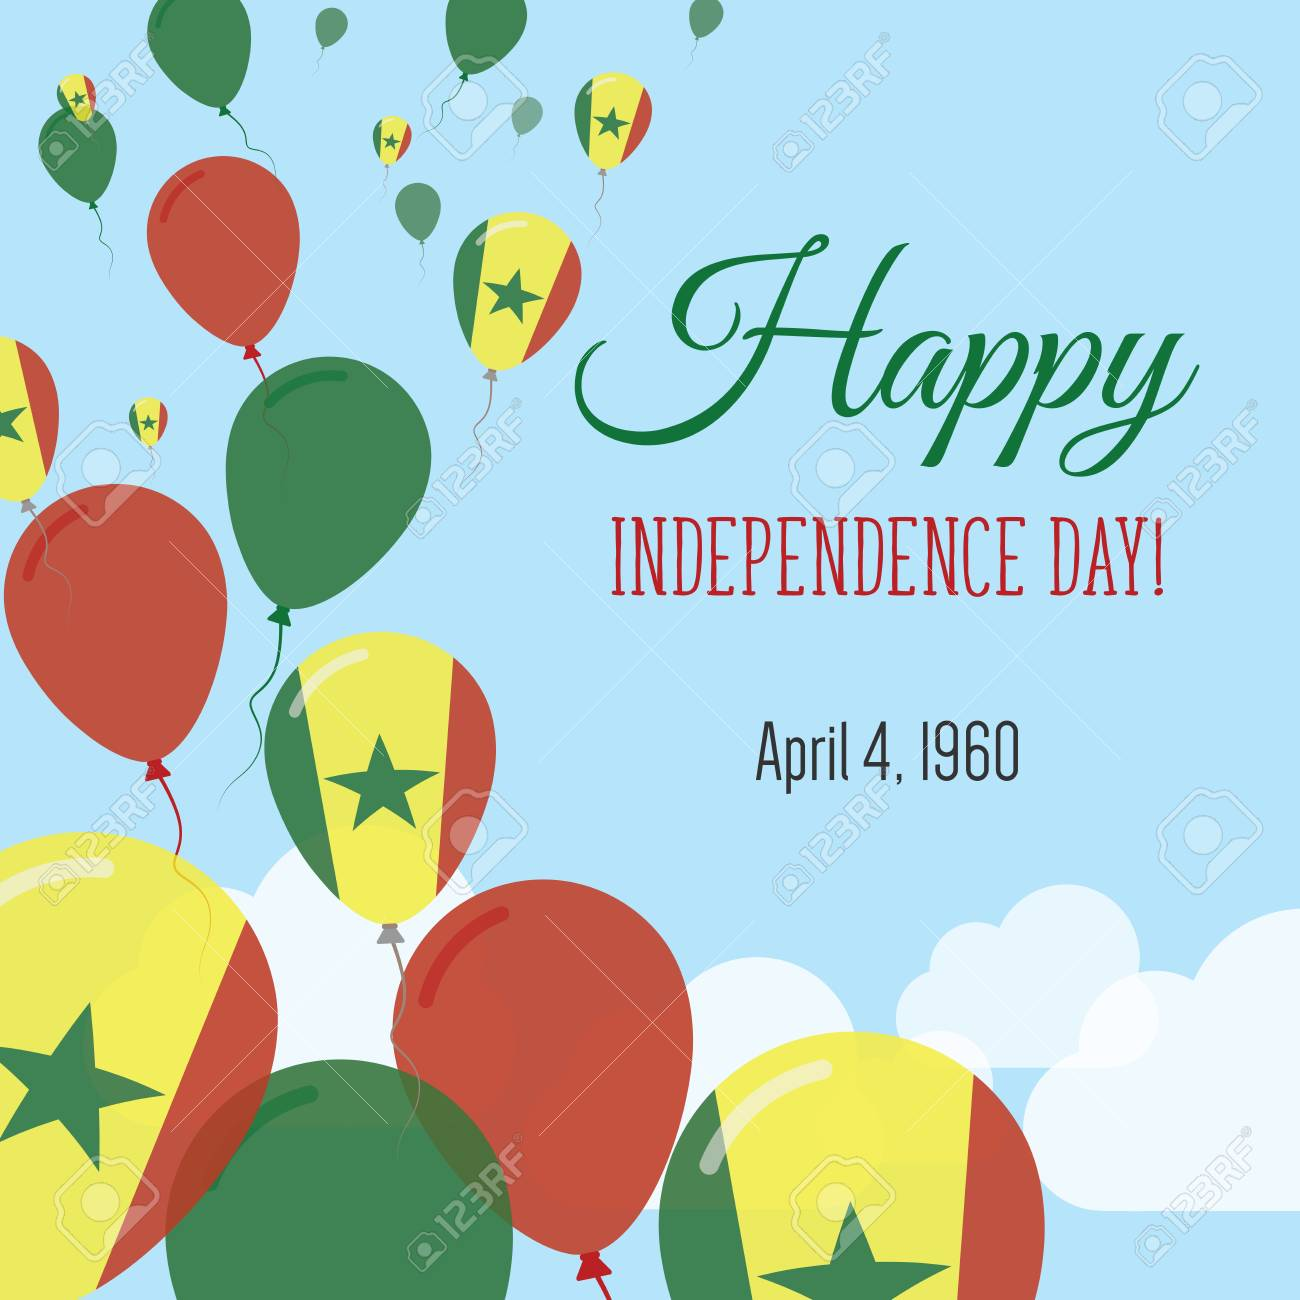 Independence day flat greeting card senegal independence day independence day flat greeting card senegal independence day senegalese flag balloons patriotic poster m4hsunfo